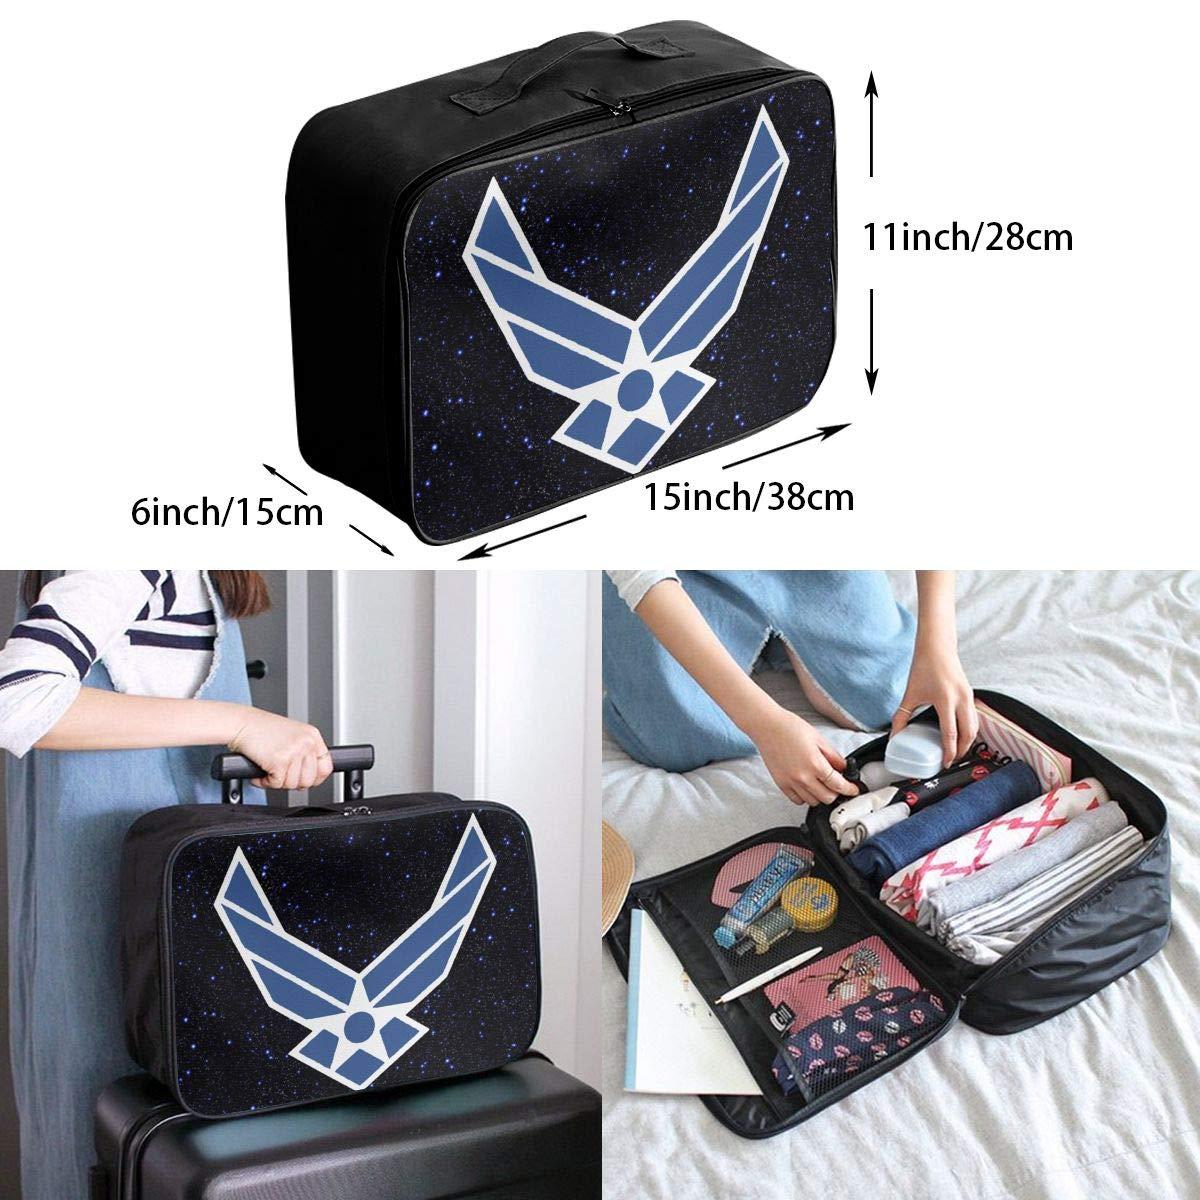 Unisex Travel Duffel Bag Waterproof Fashion Lightweight Large Capacity Portable Luggage Bag Us Air Force Usaf